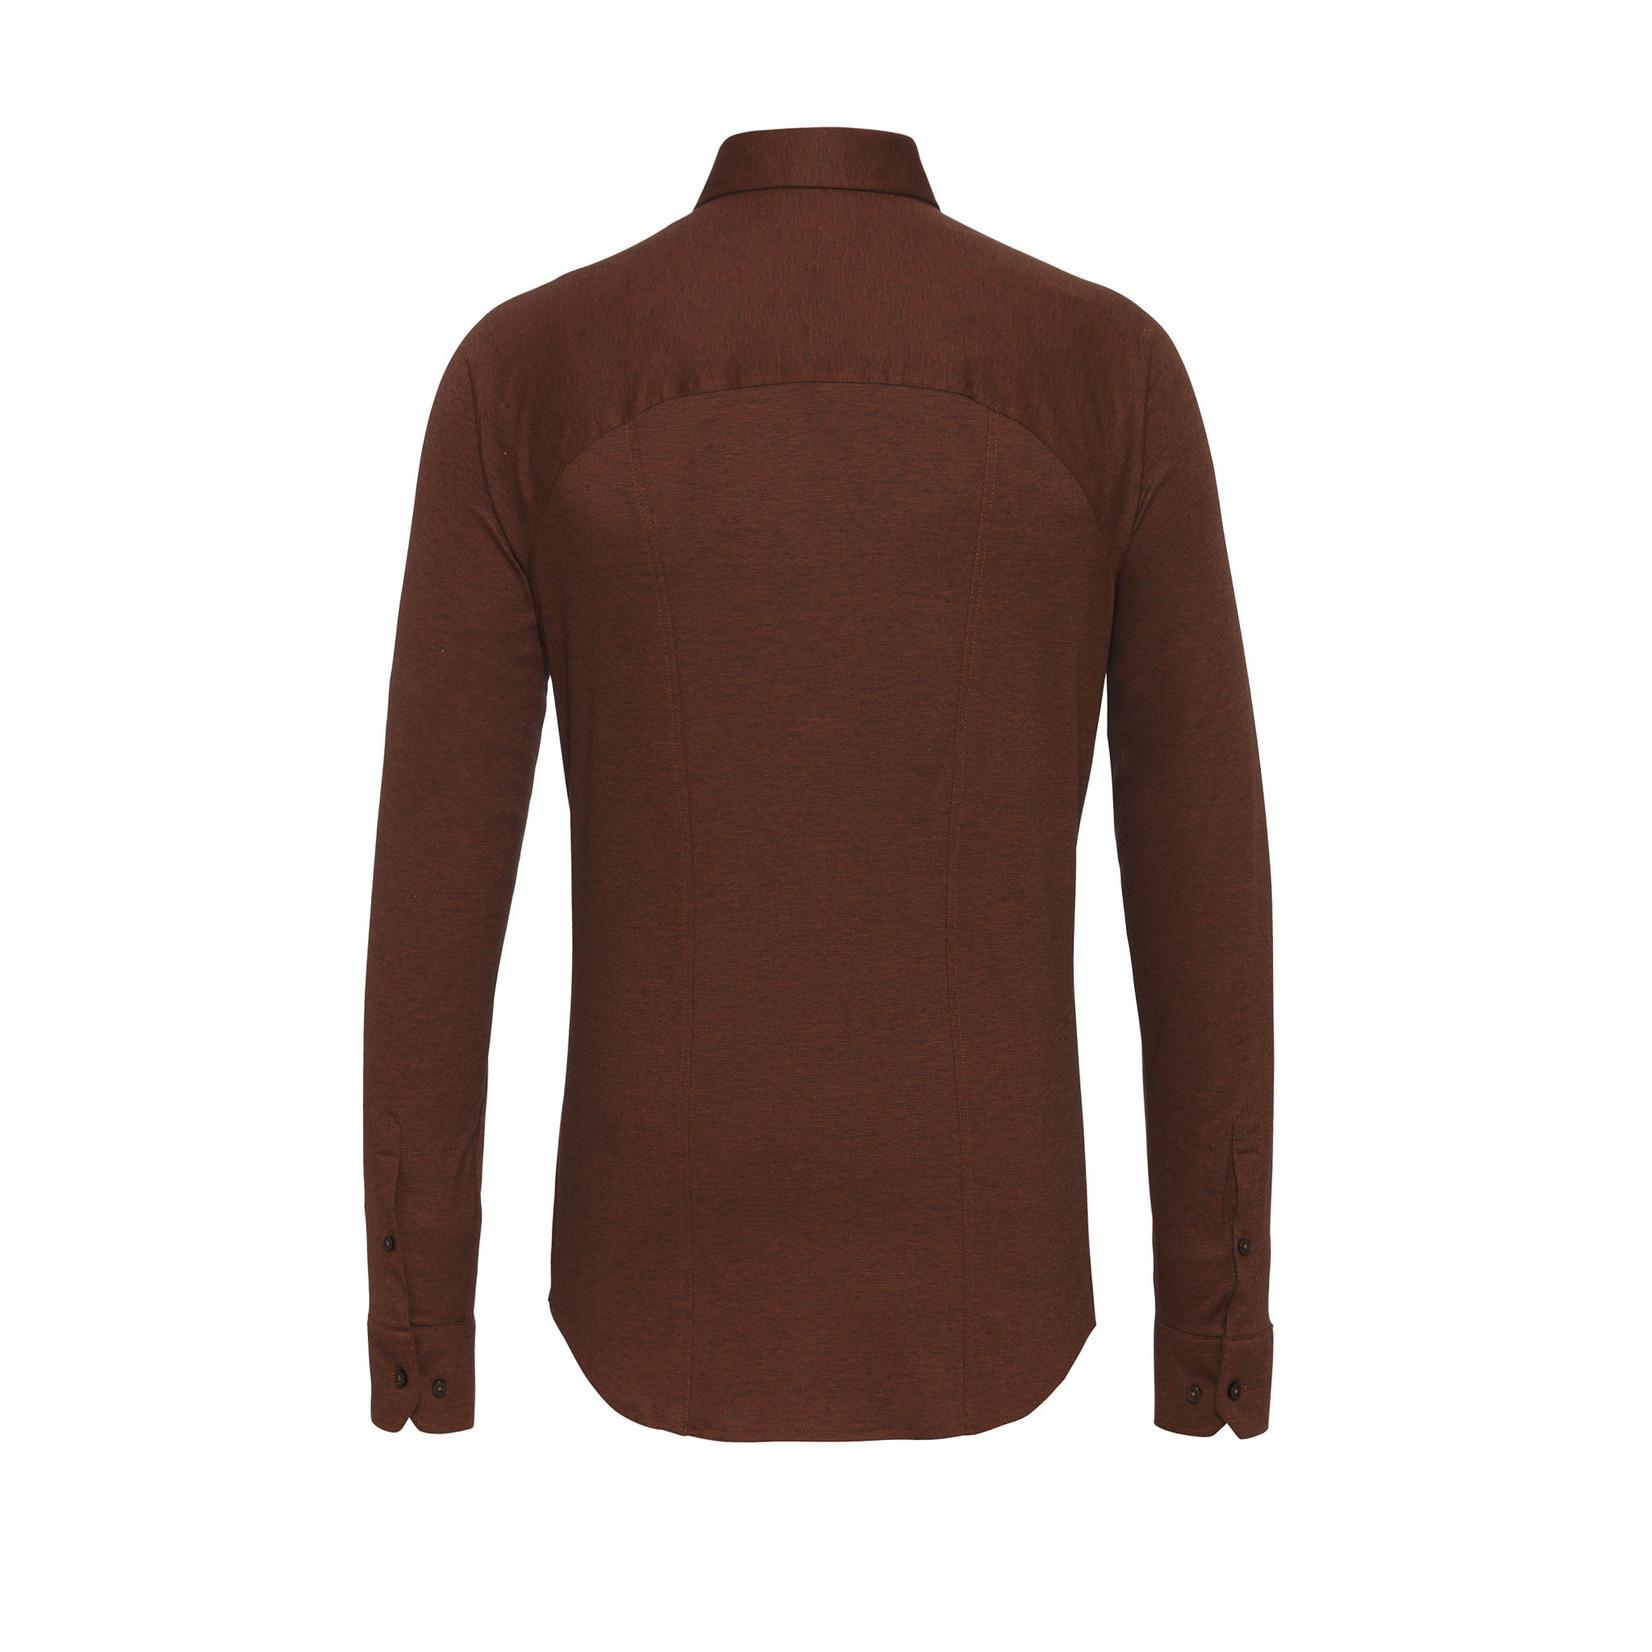 Desoto jersey overhemd brique